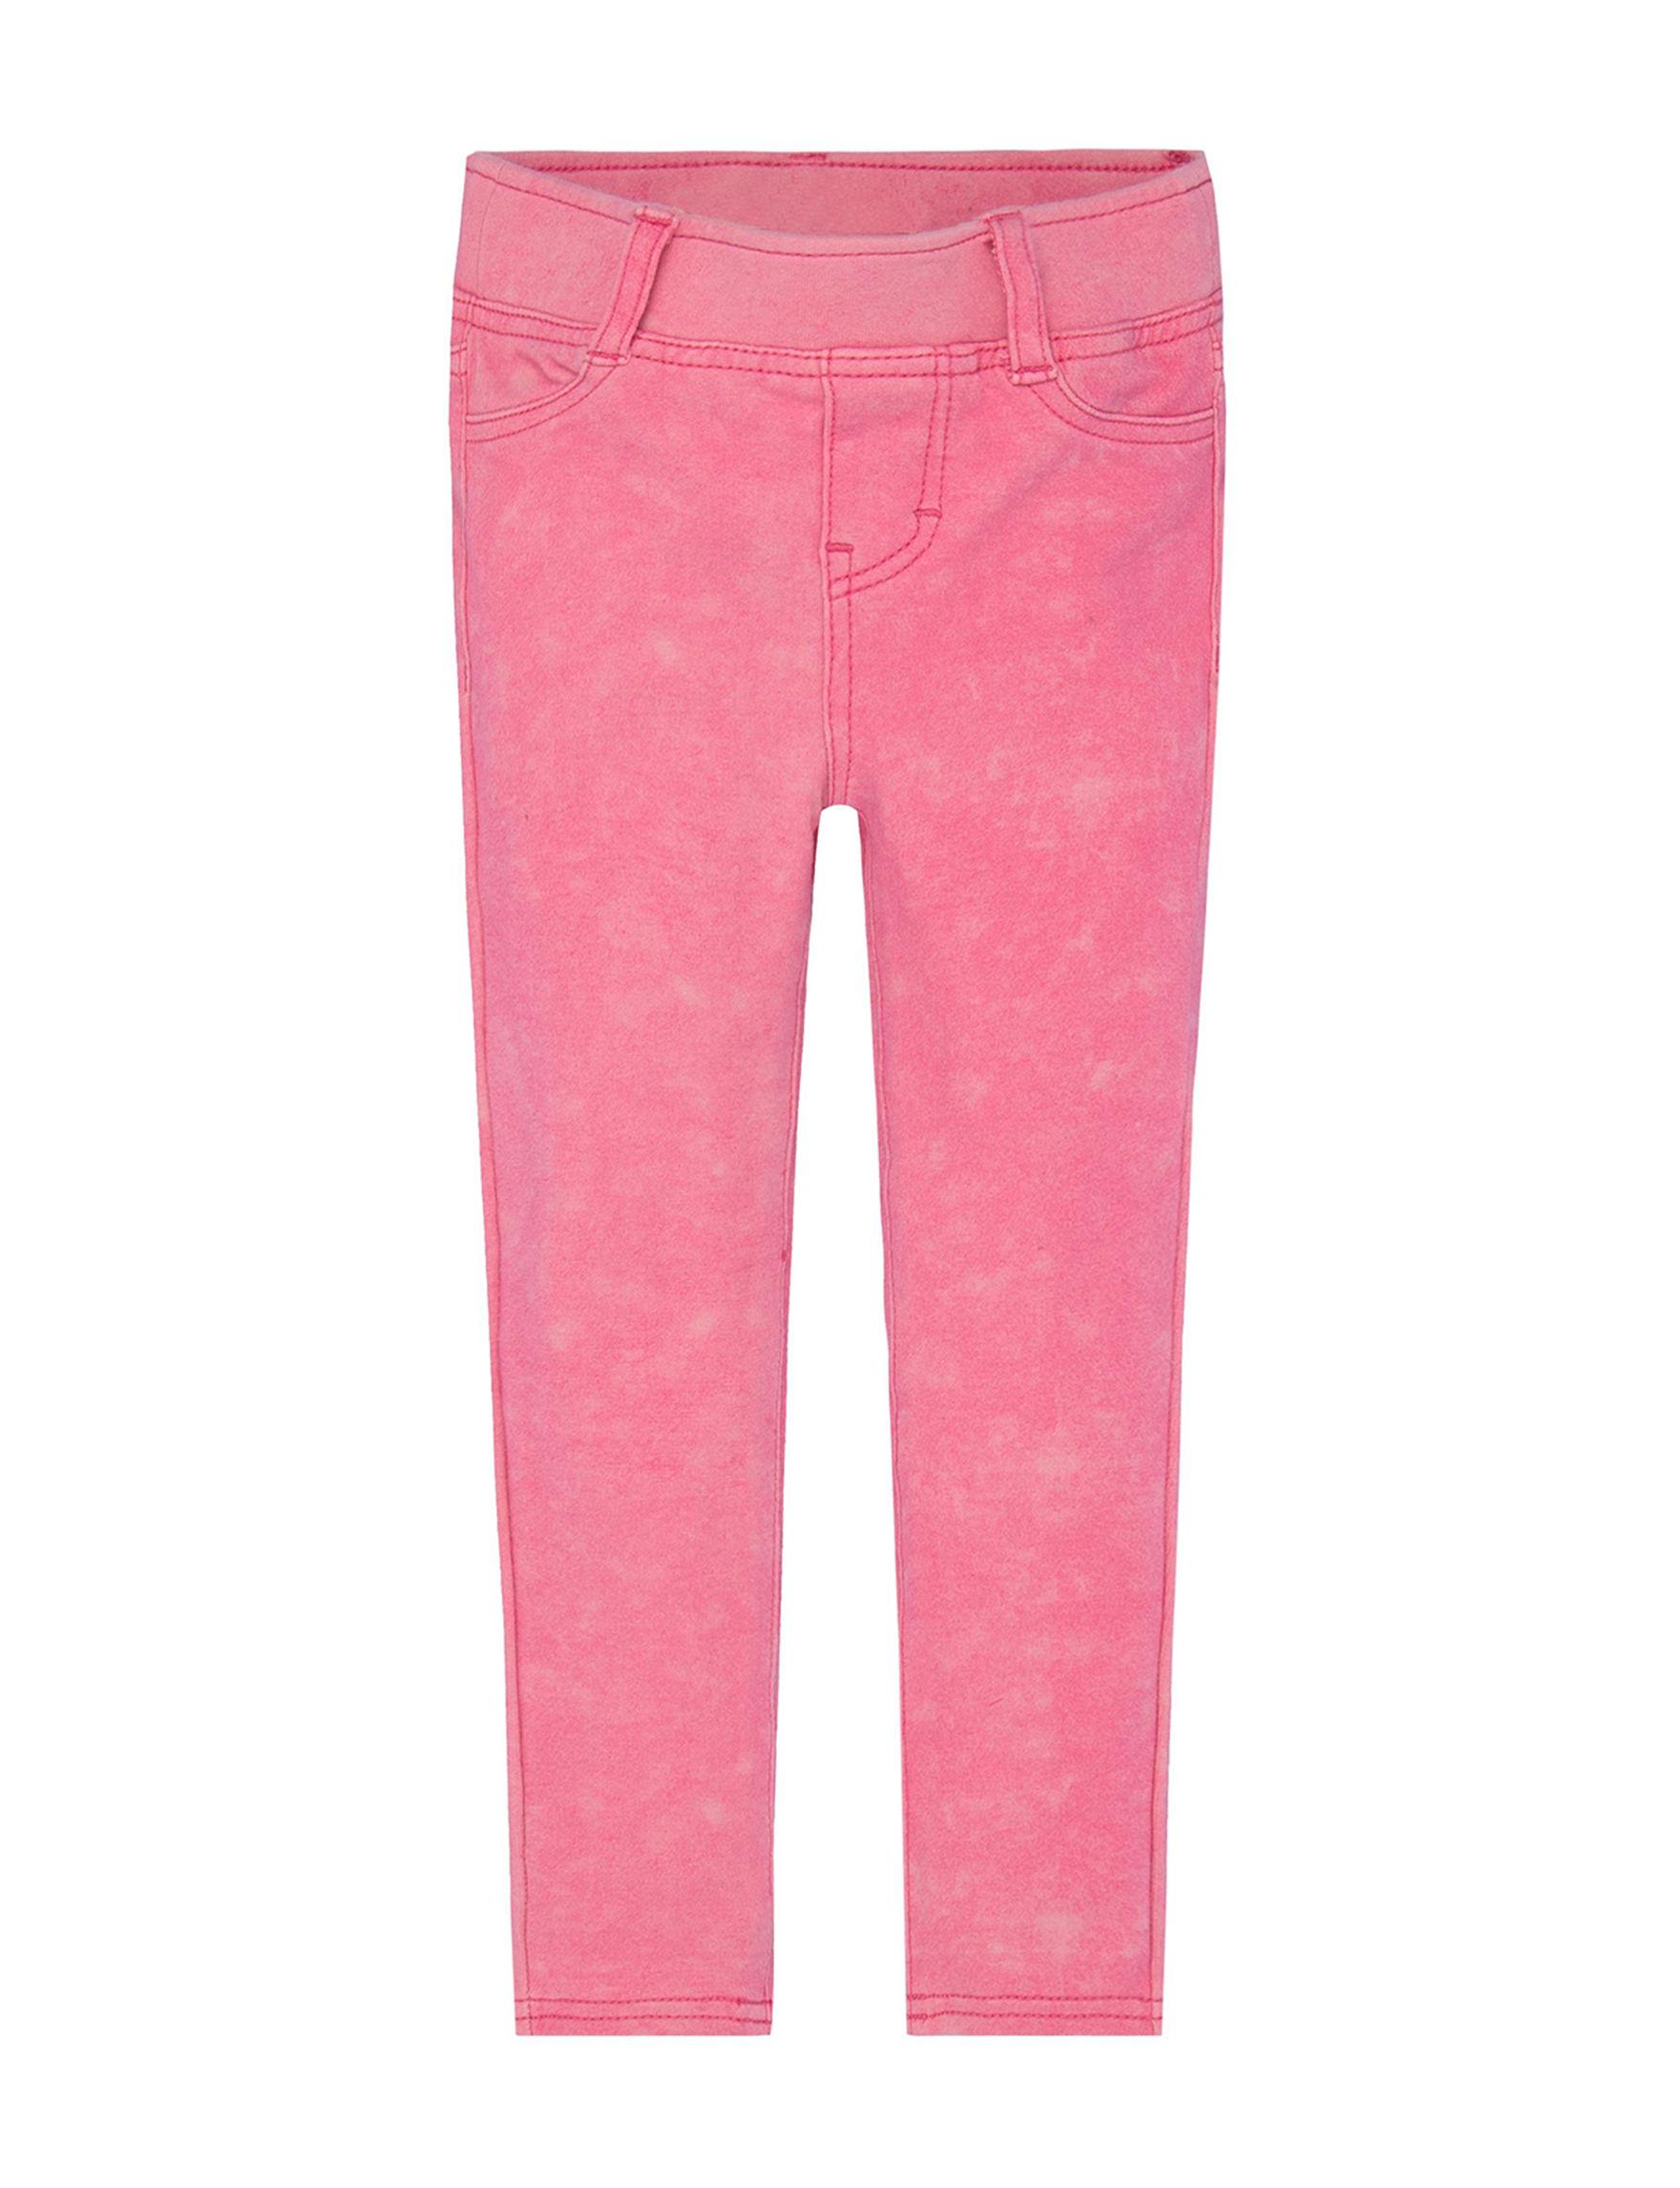 Levi's Pink Jeggings Stretch